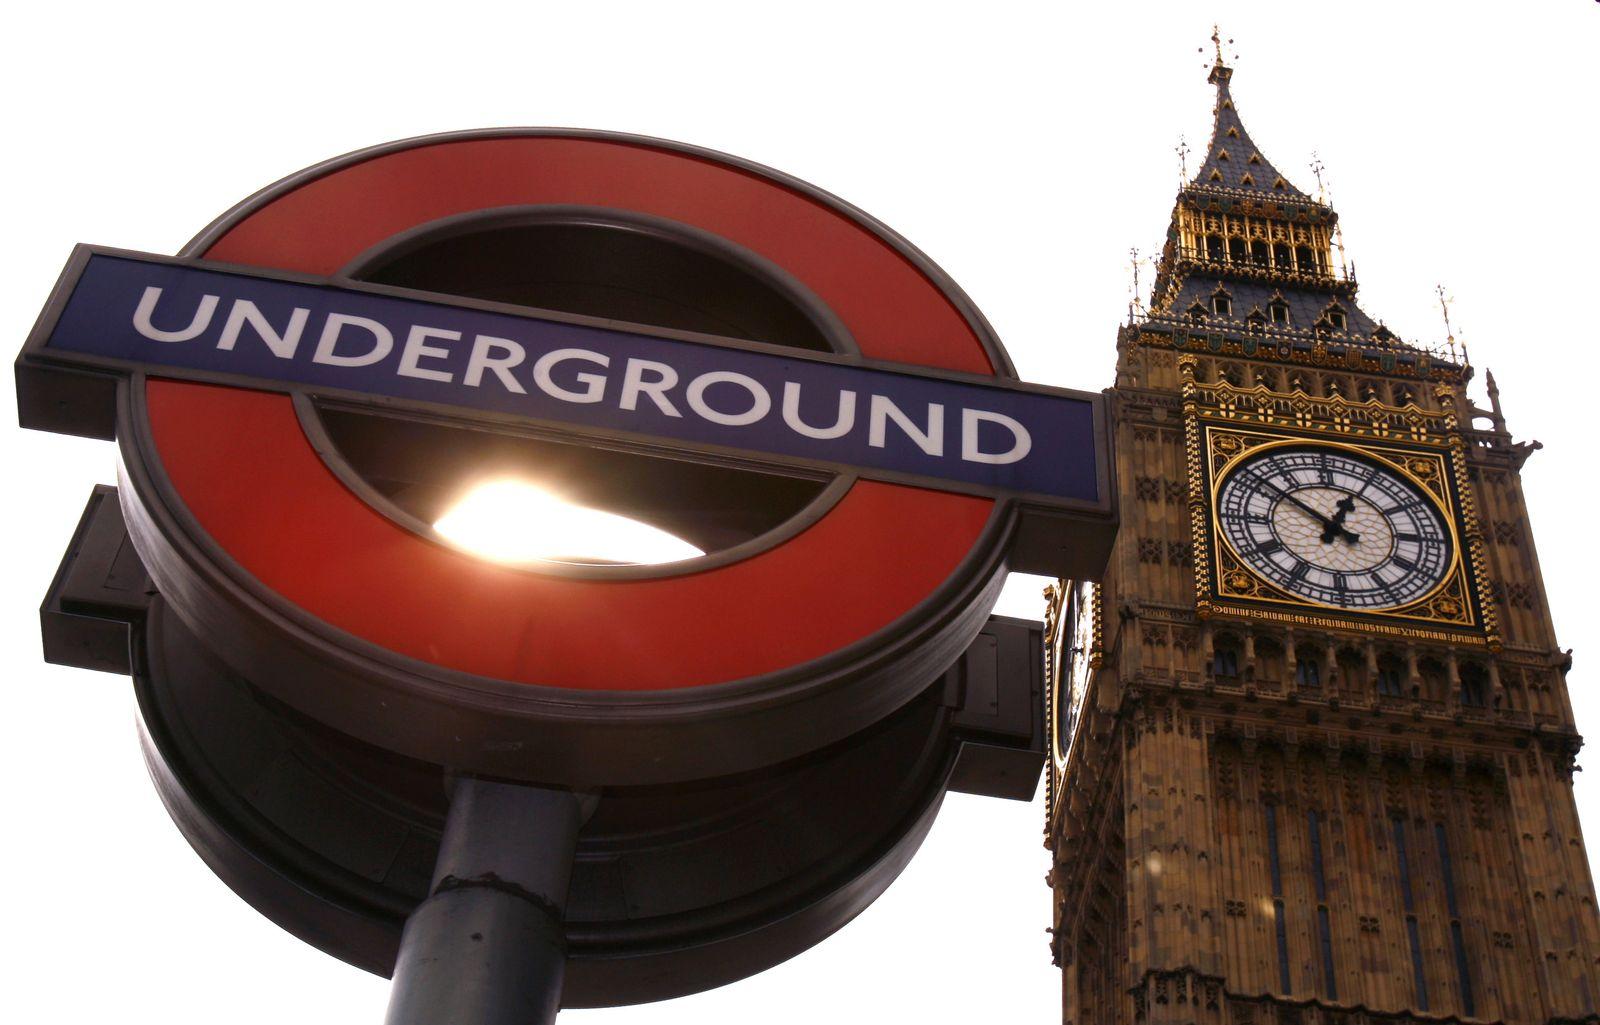 Big Ben / London / U-Bahn